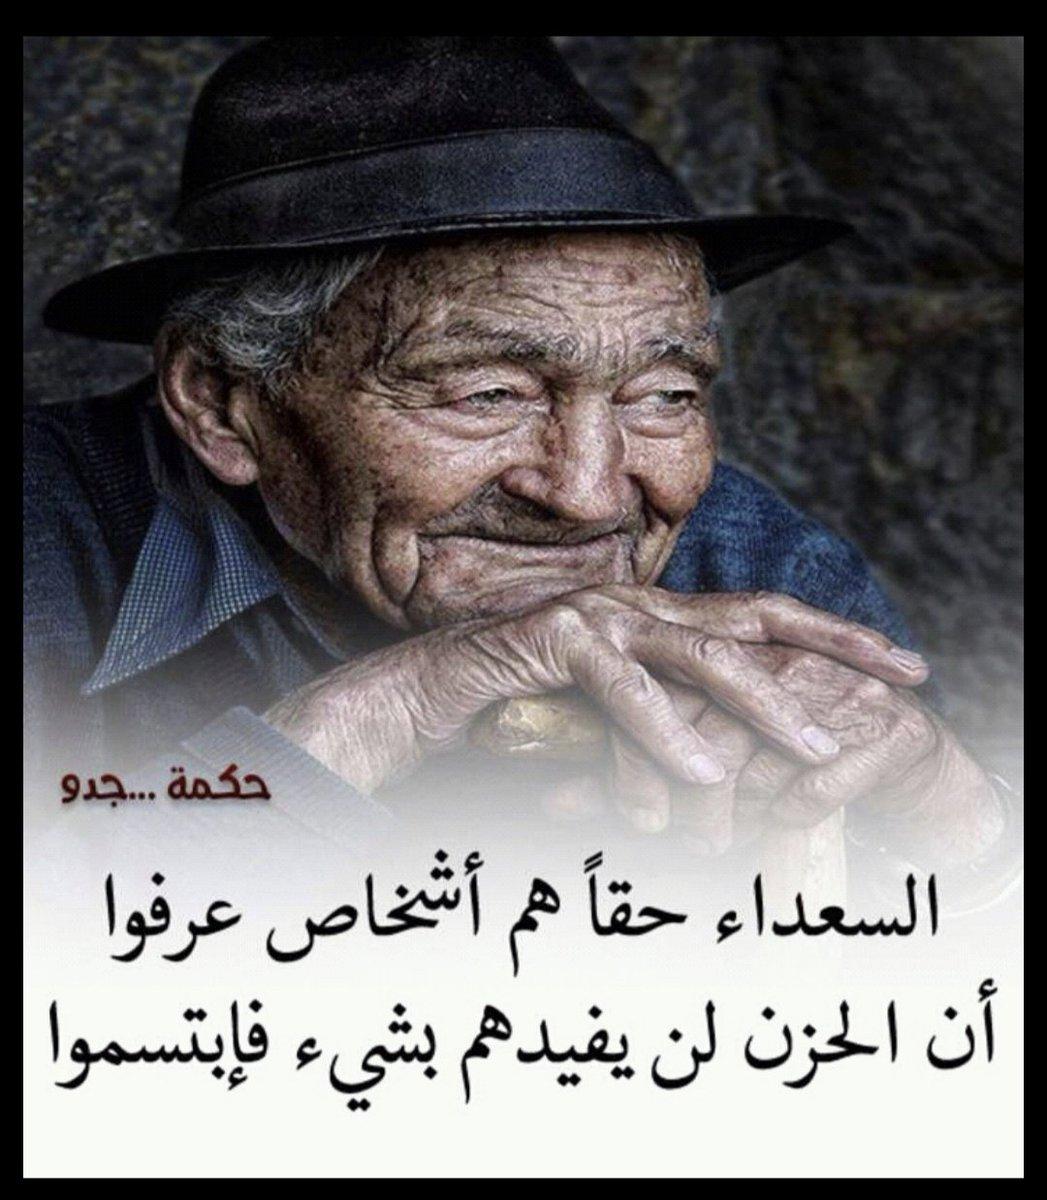 RT @moaathalamer: #جمهورك_ينتظرك_بدايه https://t.co/SimI97RpwT